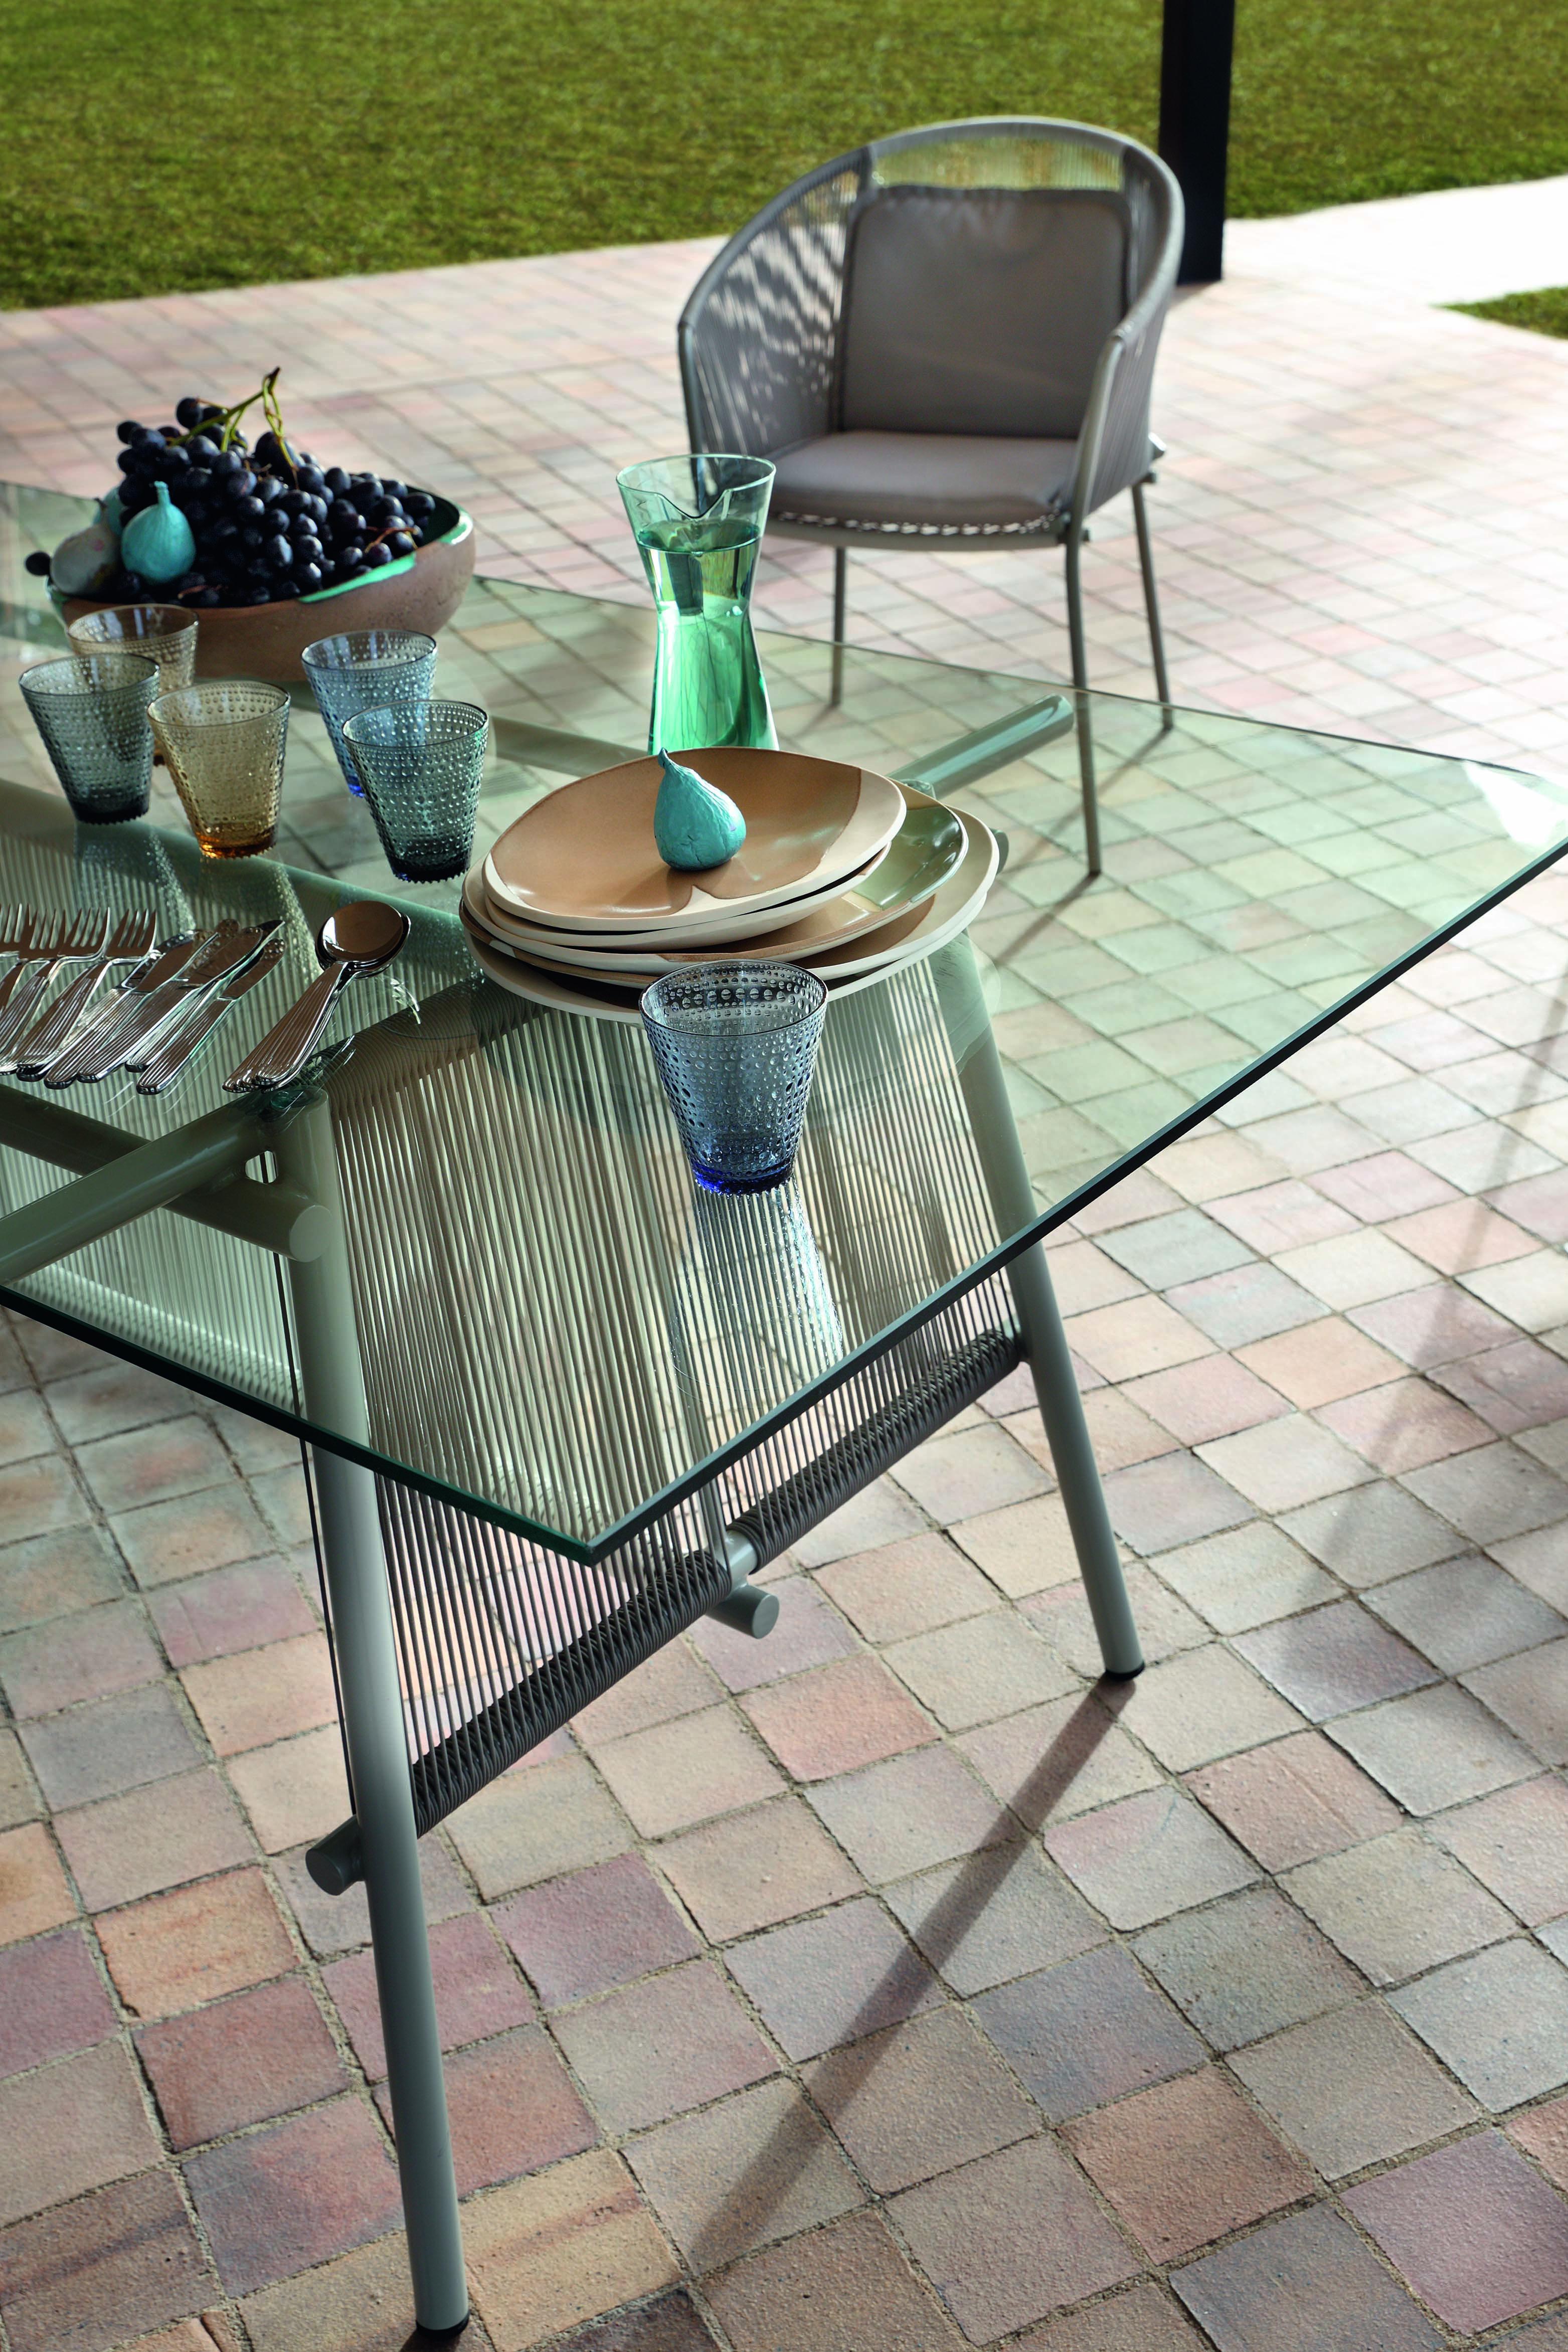 Roche Bobois Traveler Collection Designed By Stephen Burks The Traveler Outdoor Collection Invites You To Rel Table De Repas Ronde Table Repas Rochebobois